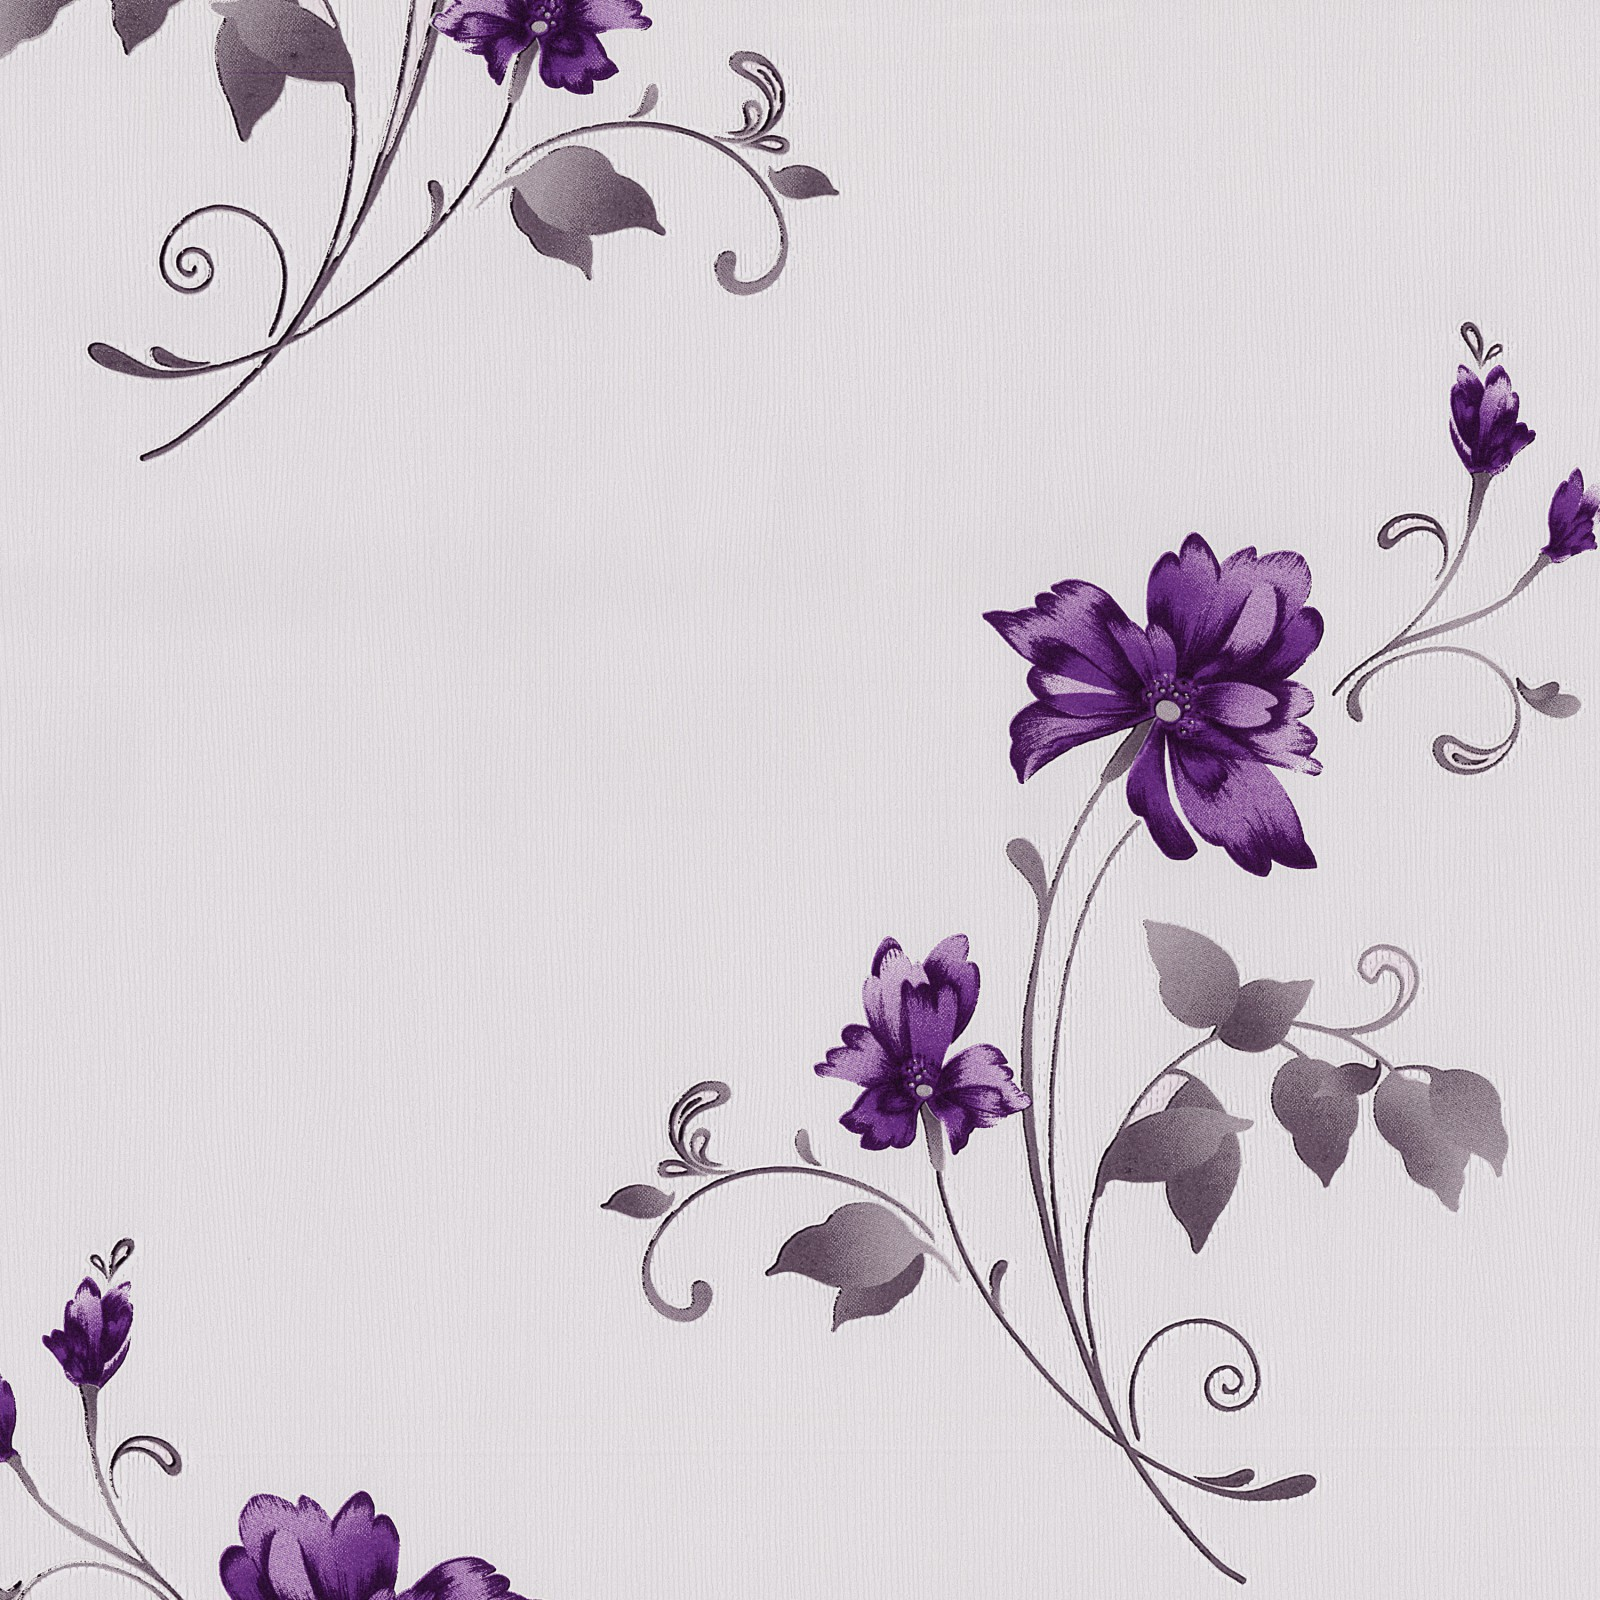 Vliestapete blumen flieder lila tapete p s pure easy 13285 40 for Lila tapete schlafzimmer